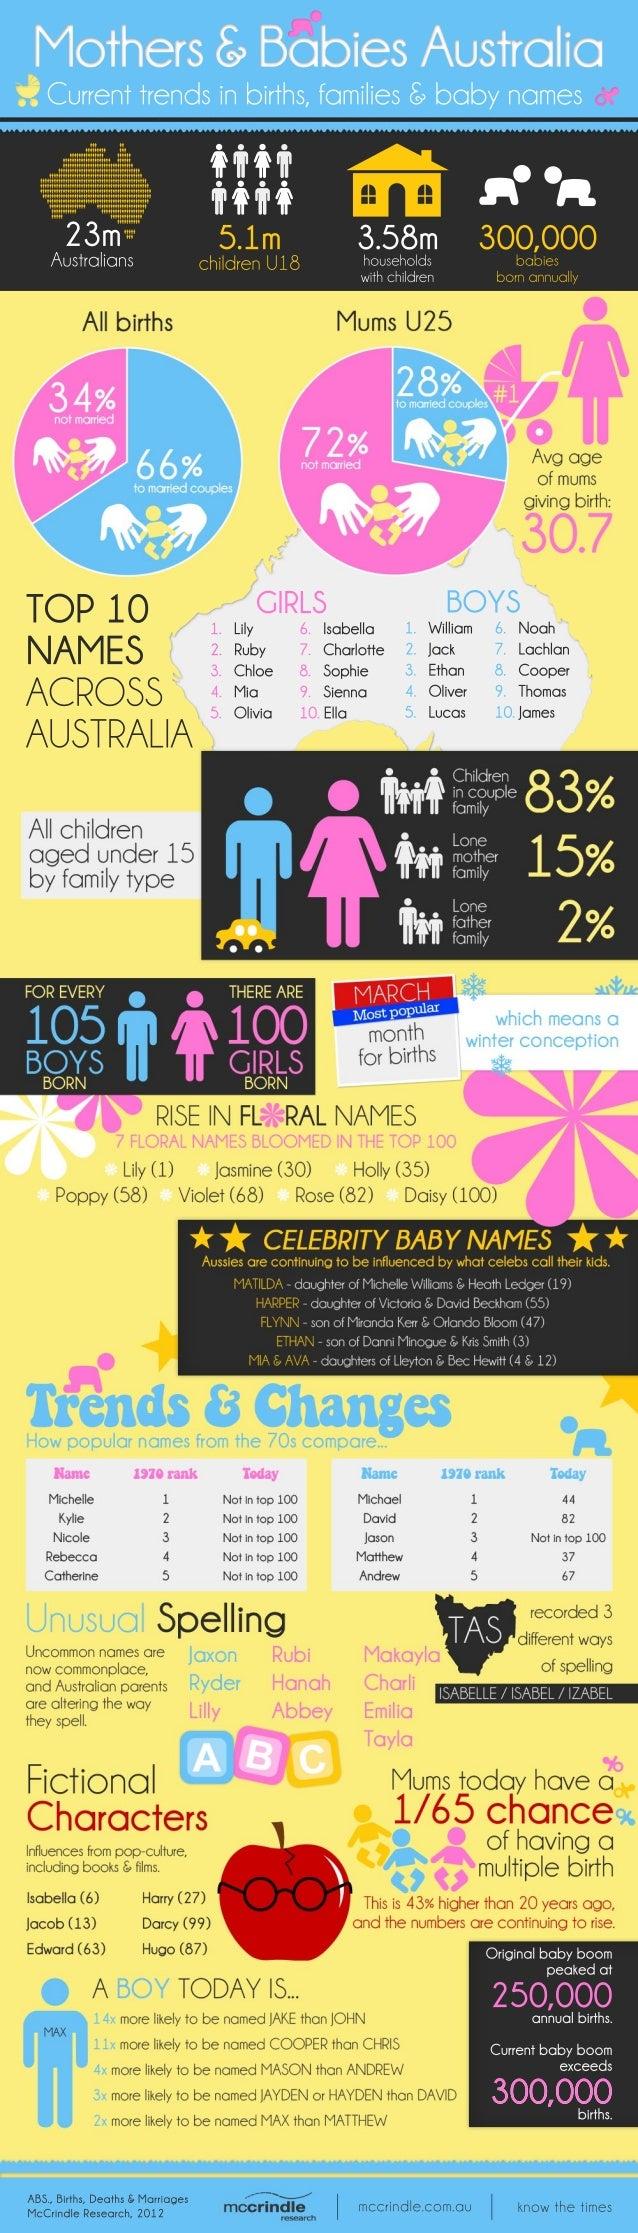 ABS.,Births,Deaths&Marriages McCrindleResearch,2012 mccrindle.com.au knowthetimes Originalbabyboom peakedat 250,000annualb...